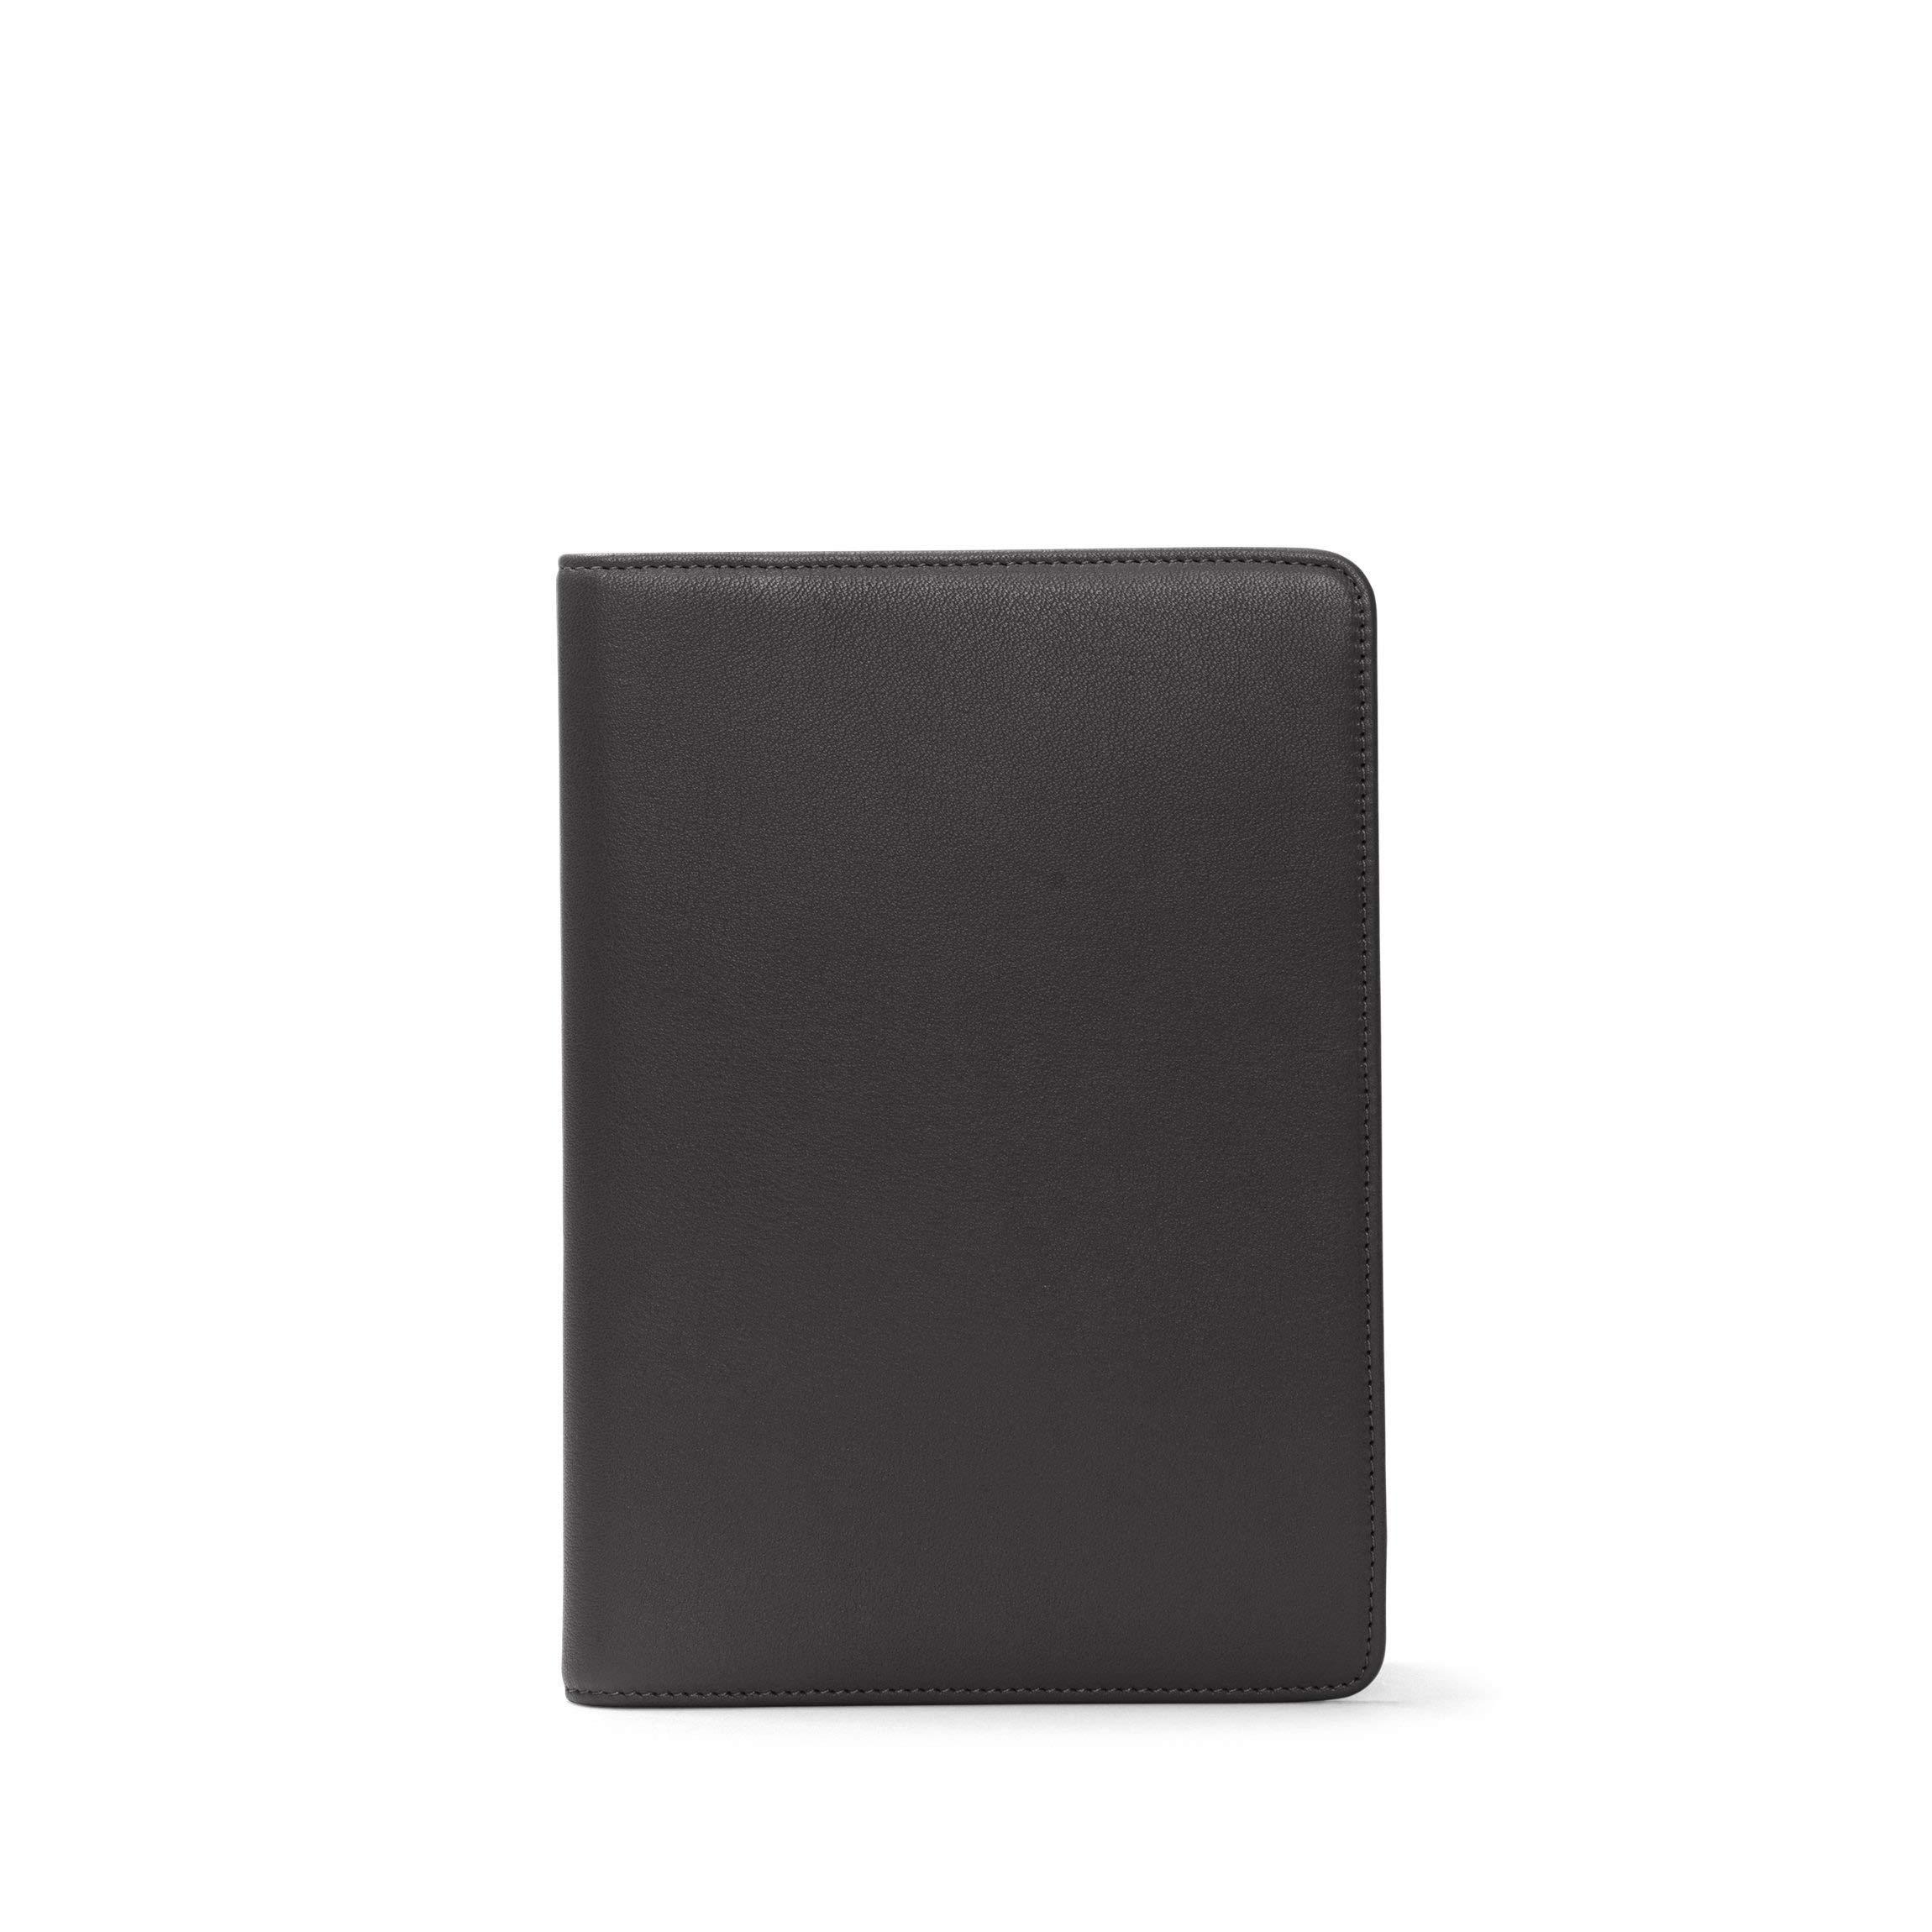 Leatherology Black Onyx Medium Journal by Leatherology